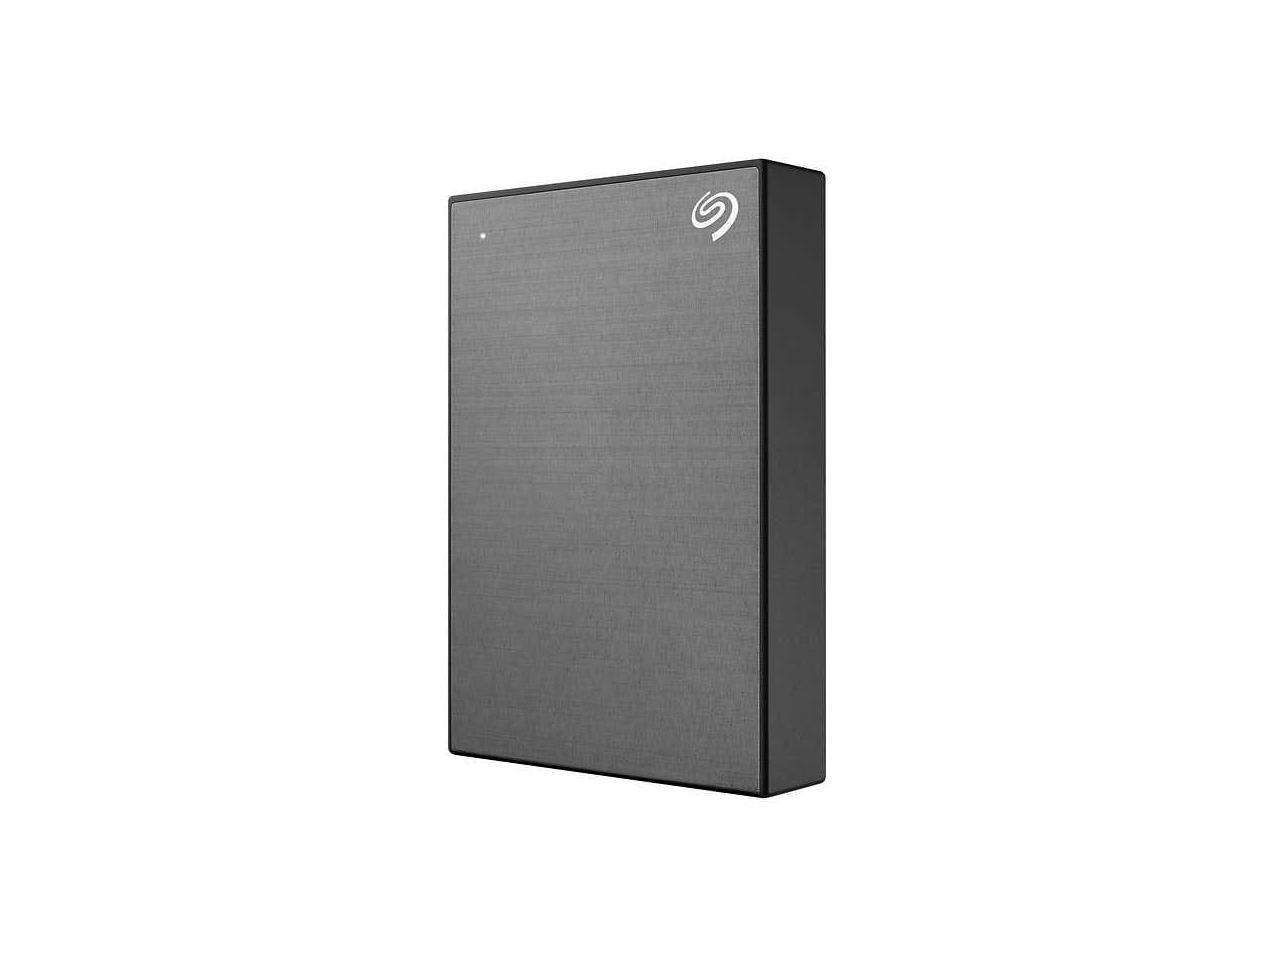 Costco Members: Seagate Backup Plus 5TB Portable Hard Drive $69.97 In-Club YMMV